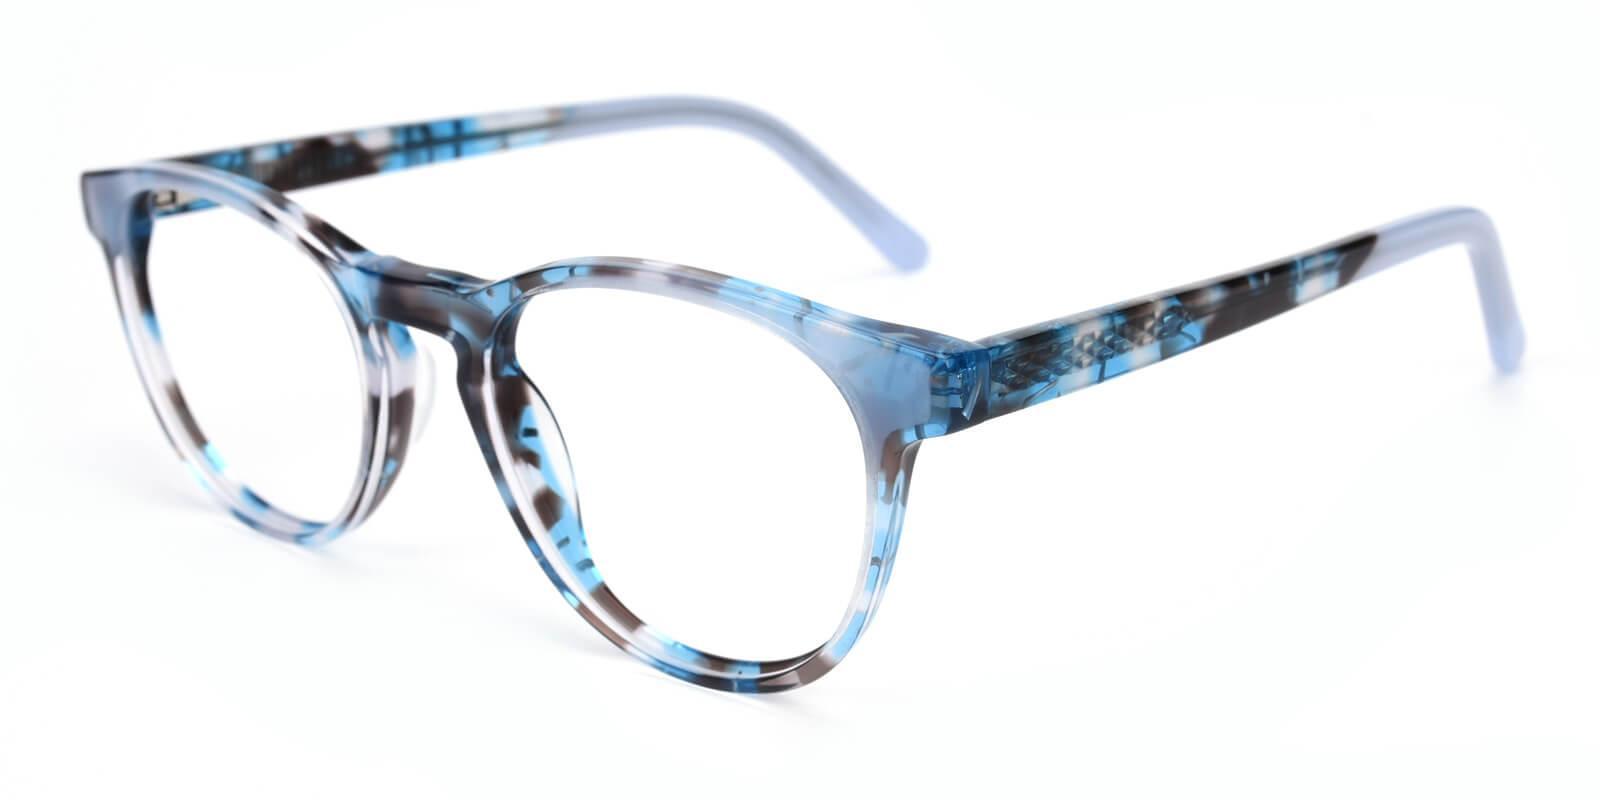 Debbine-Blue-Oval-Acetate-Eyeglasses-additional1